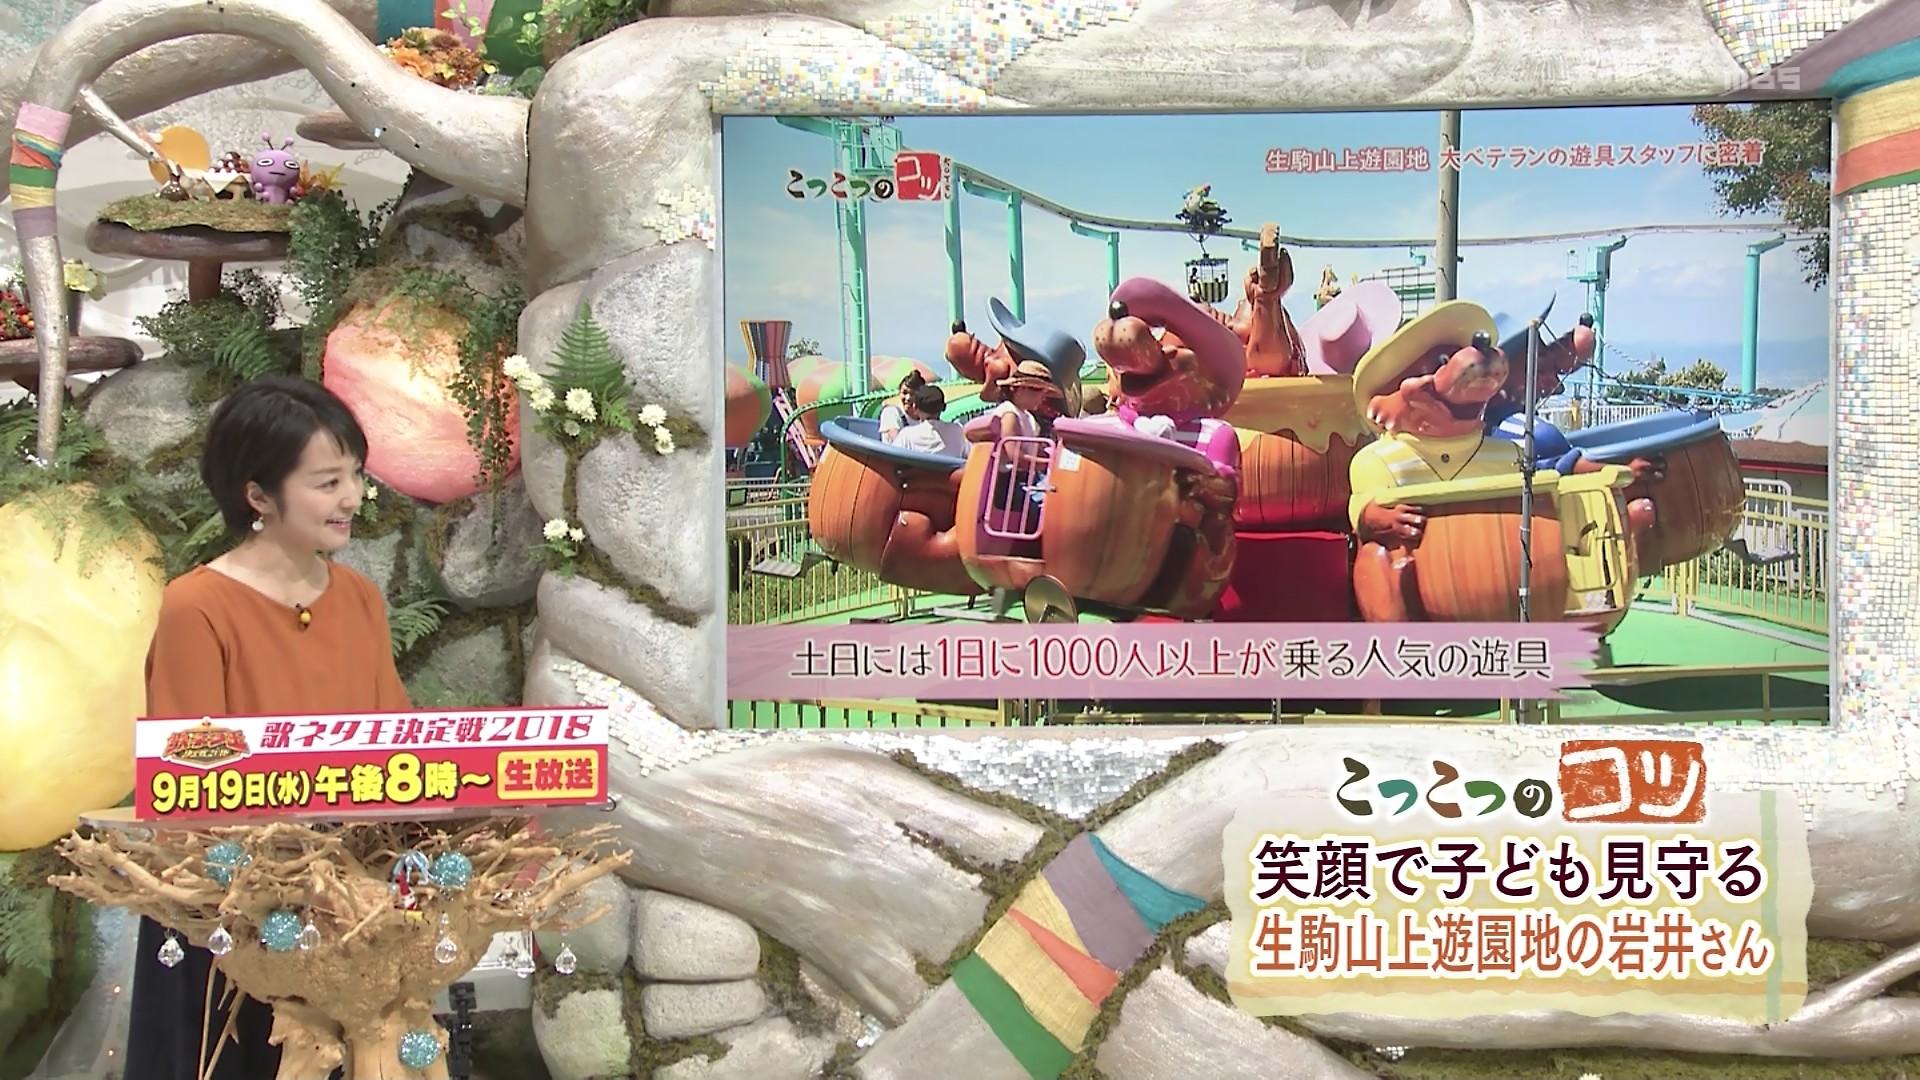 MBS藤林温子さんのテレビキャプチャー画像-016